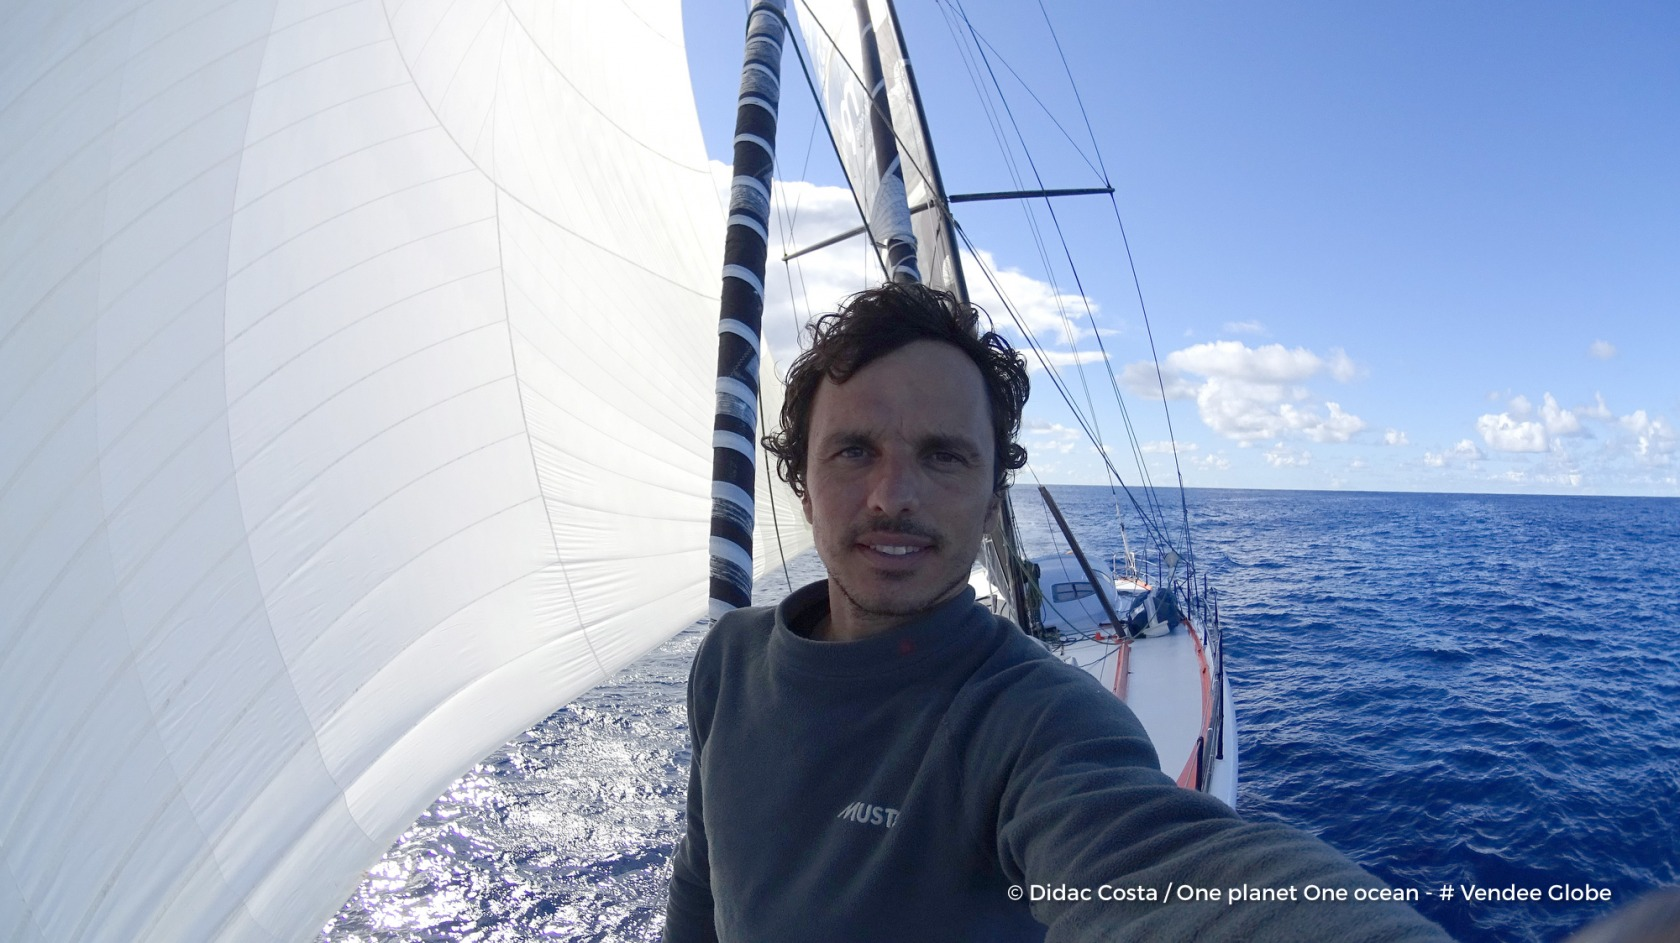 L'Espagnol Didac Costa termine le Vendée Globe en 14e position